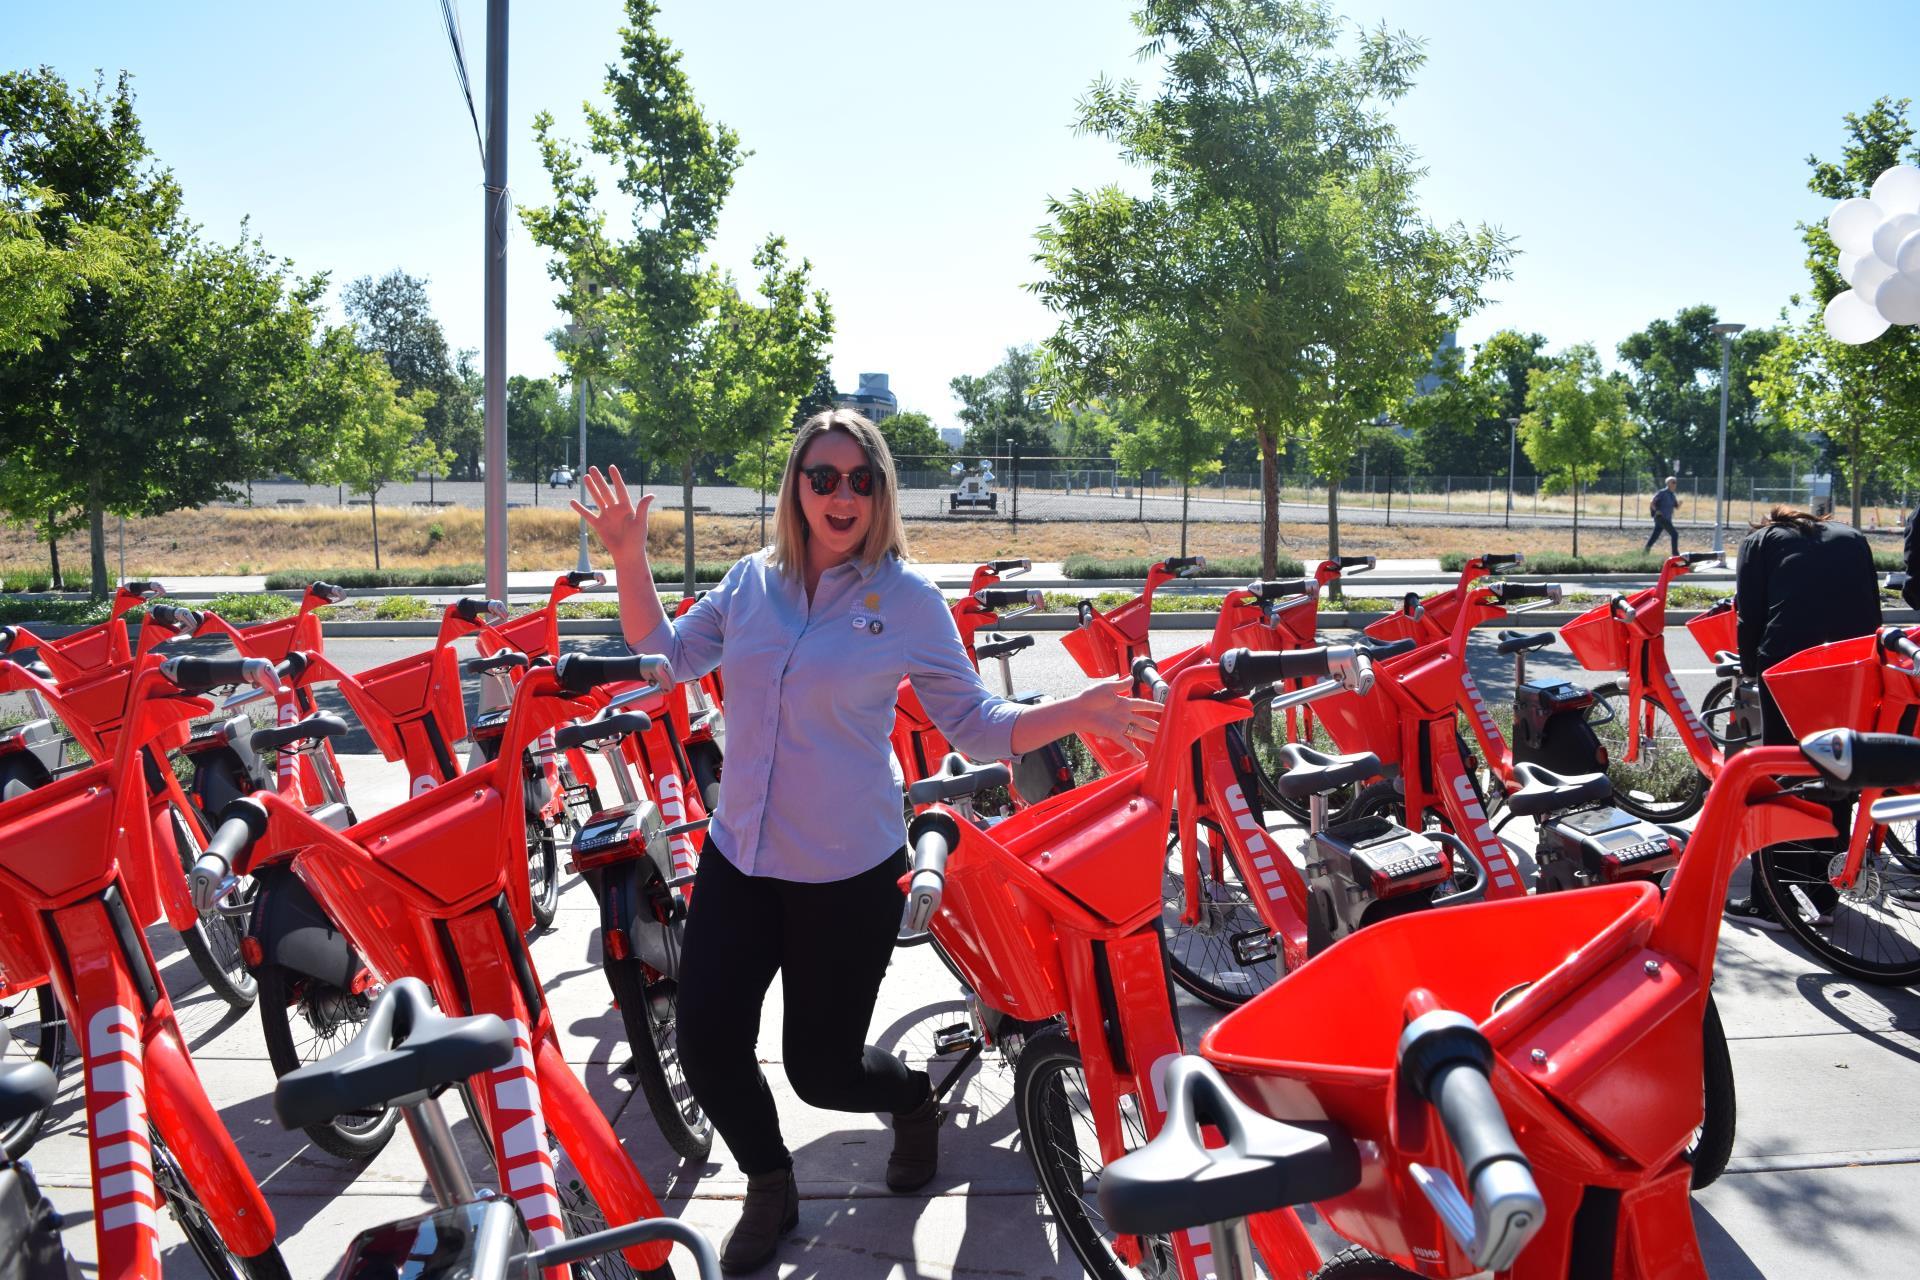 jump bikes photo with city staff member sarah strand at raley field